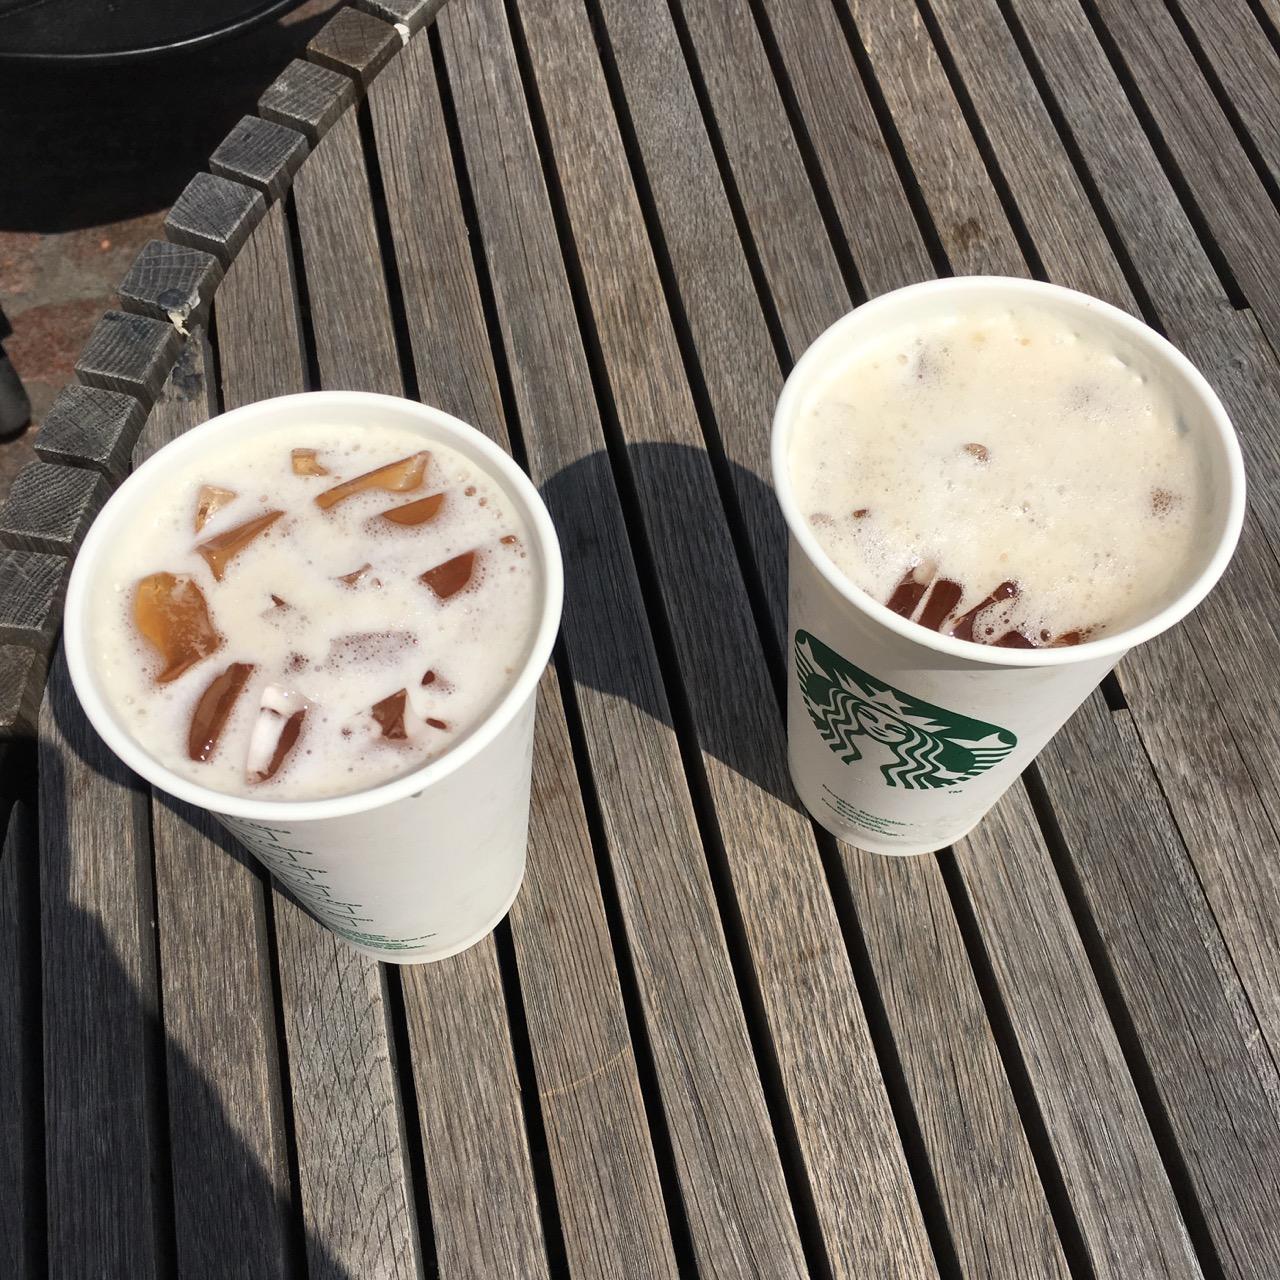 2 Starbucks plastic cups